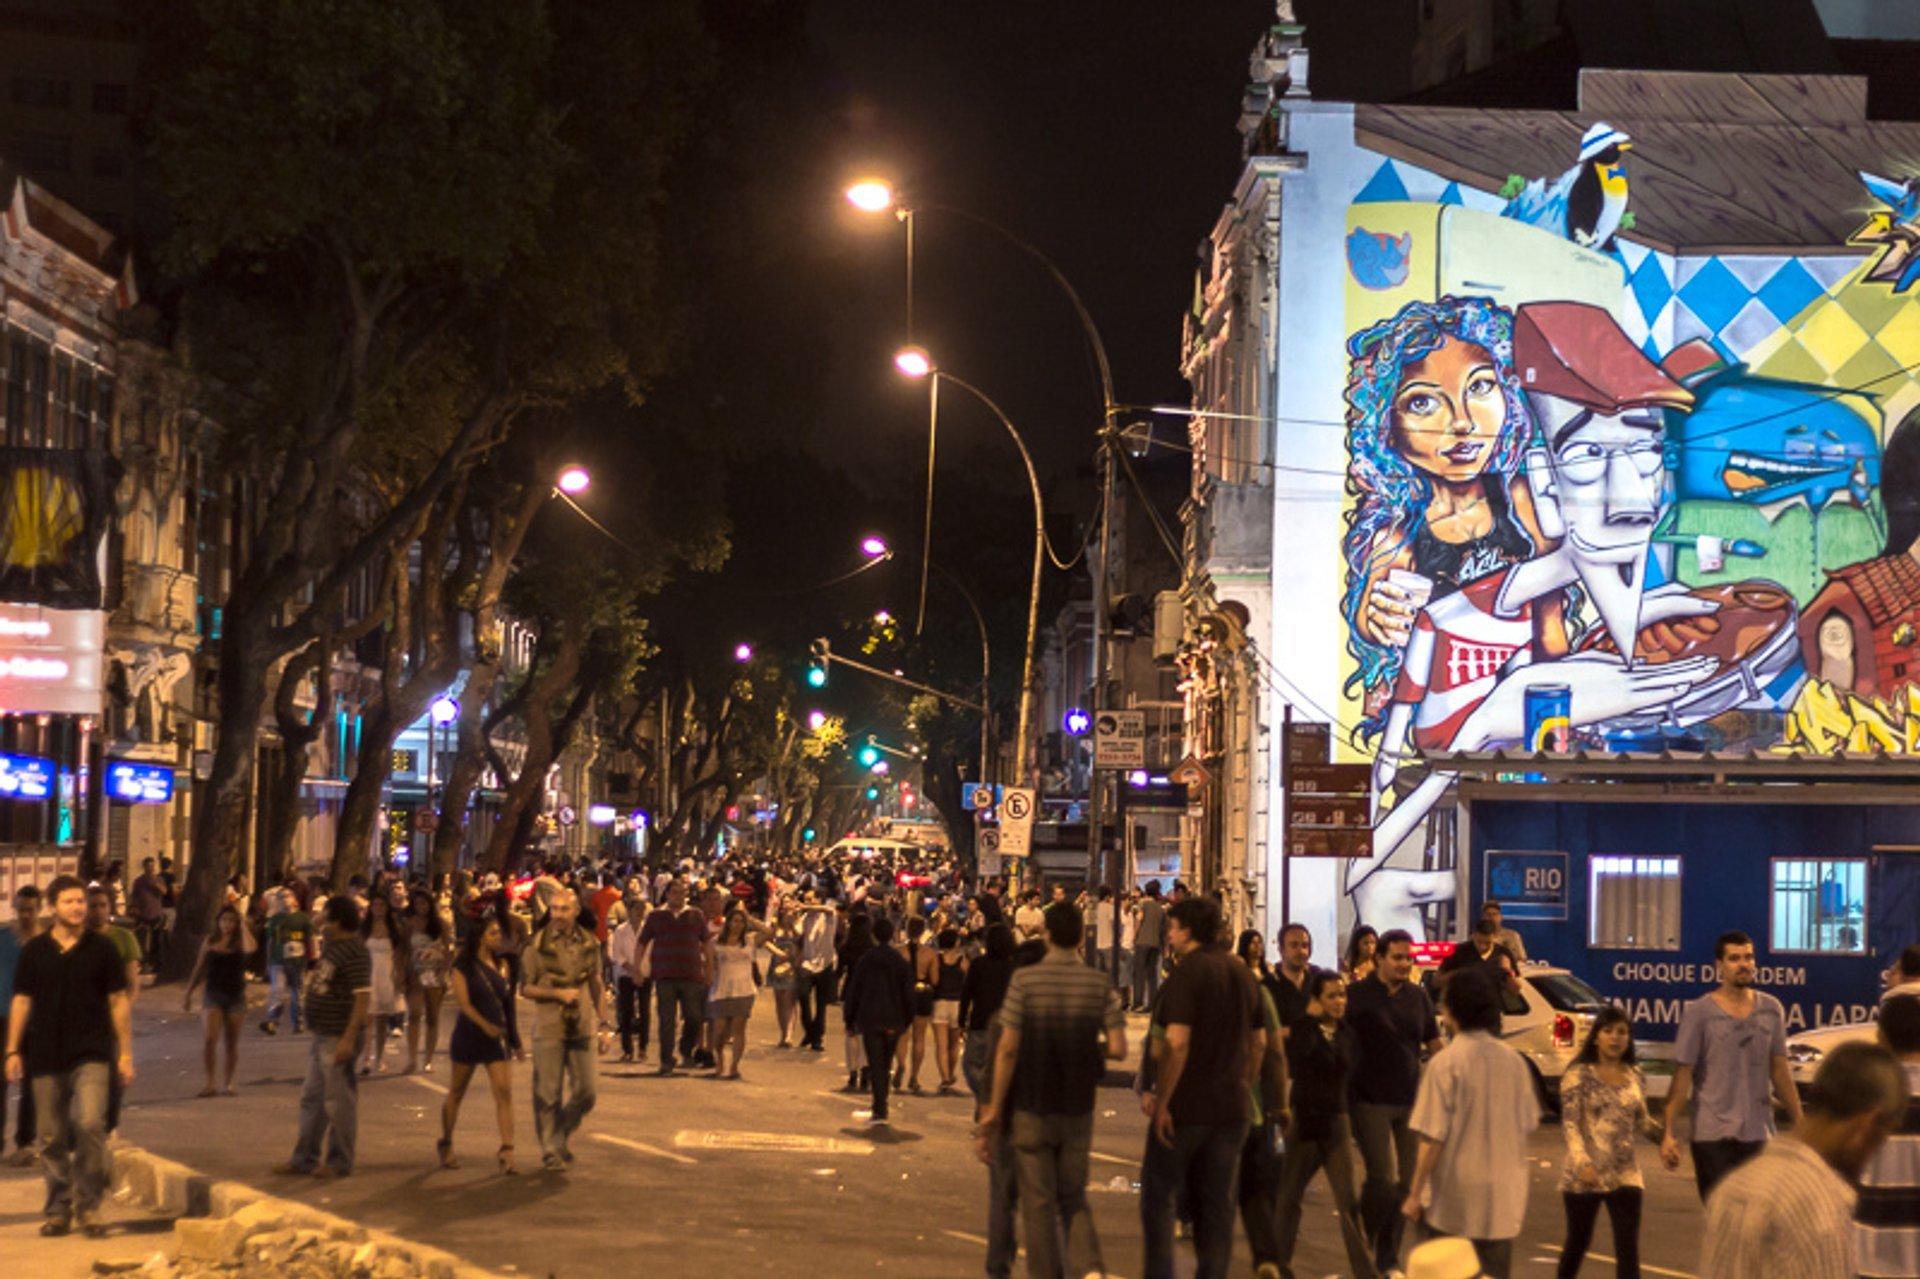 Lapa in Rio de Janeiro - Best Season 2020